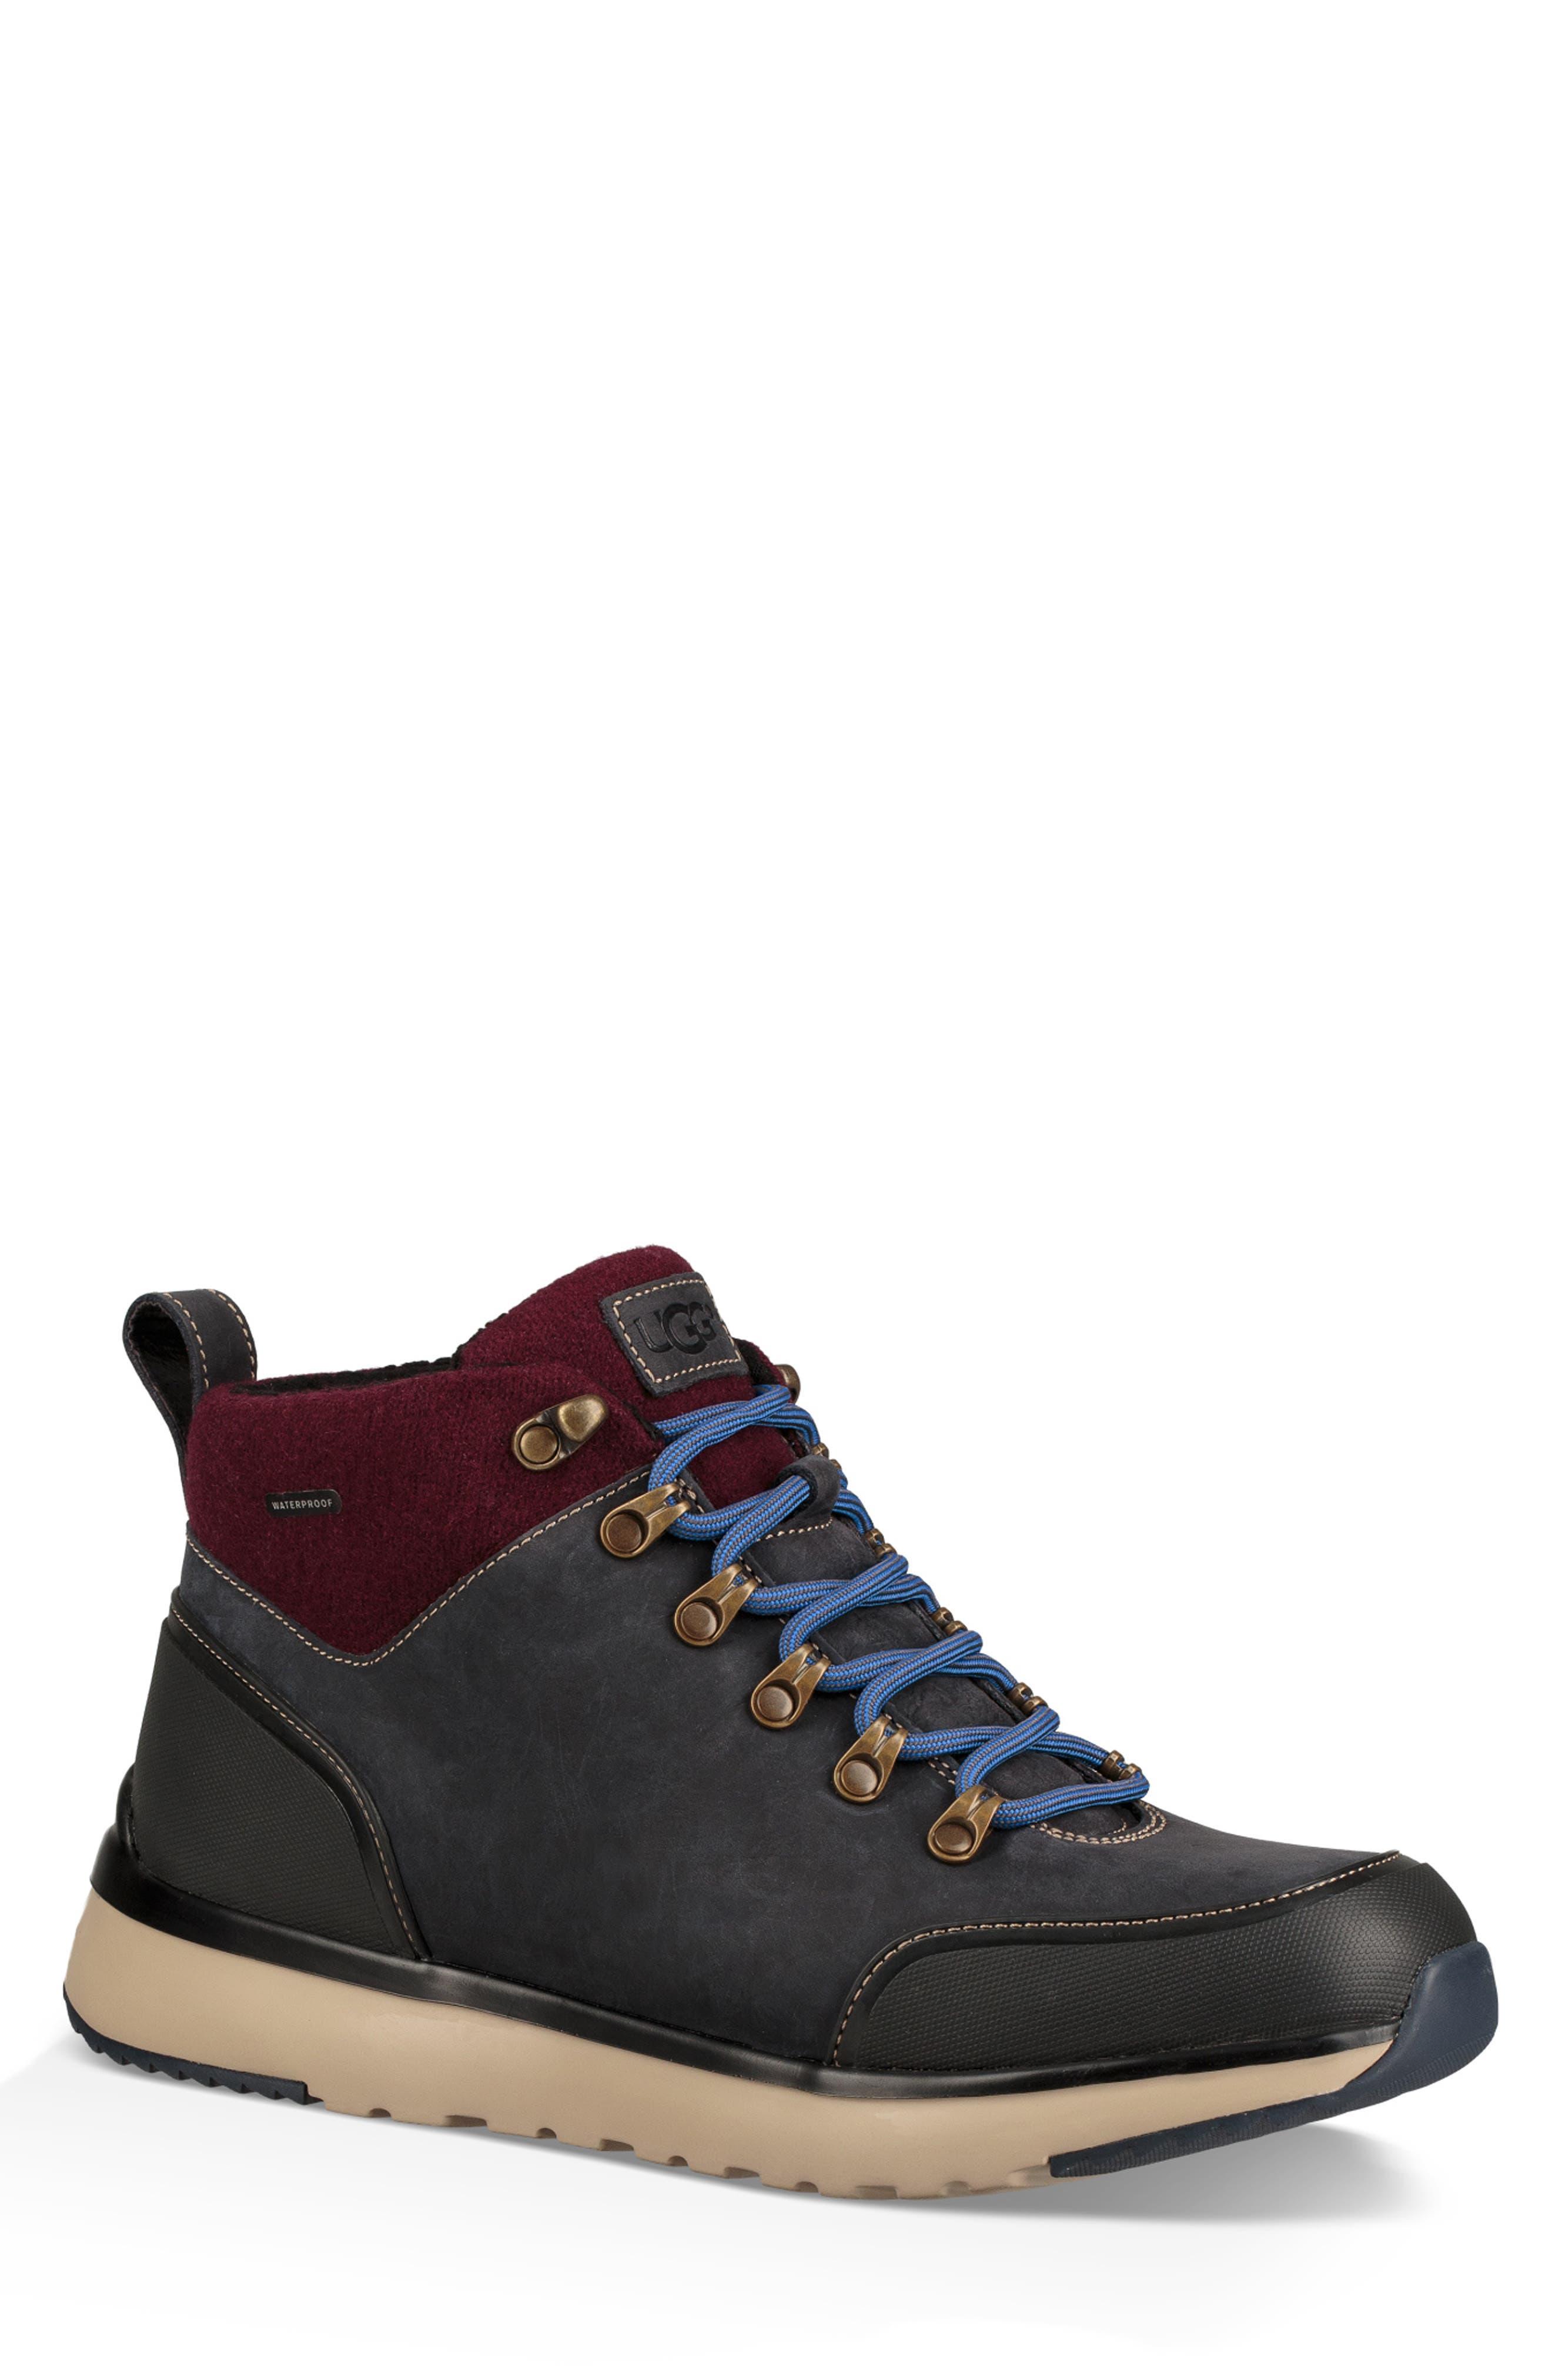 Ugg Olivert Hiking Waterproof Boot- Blue